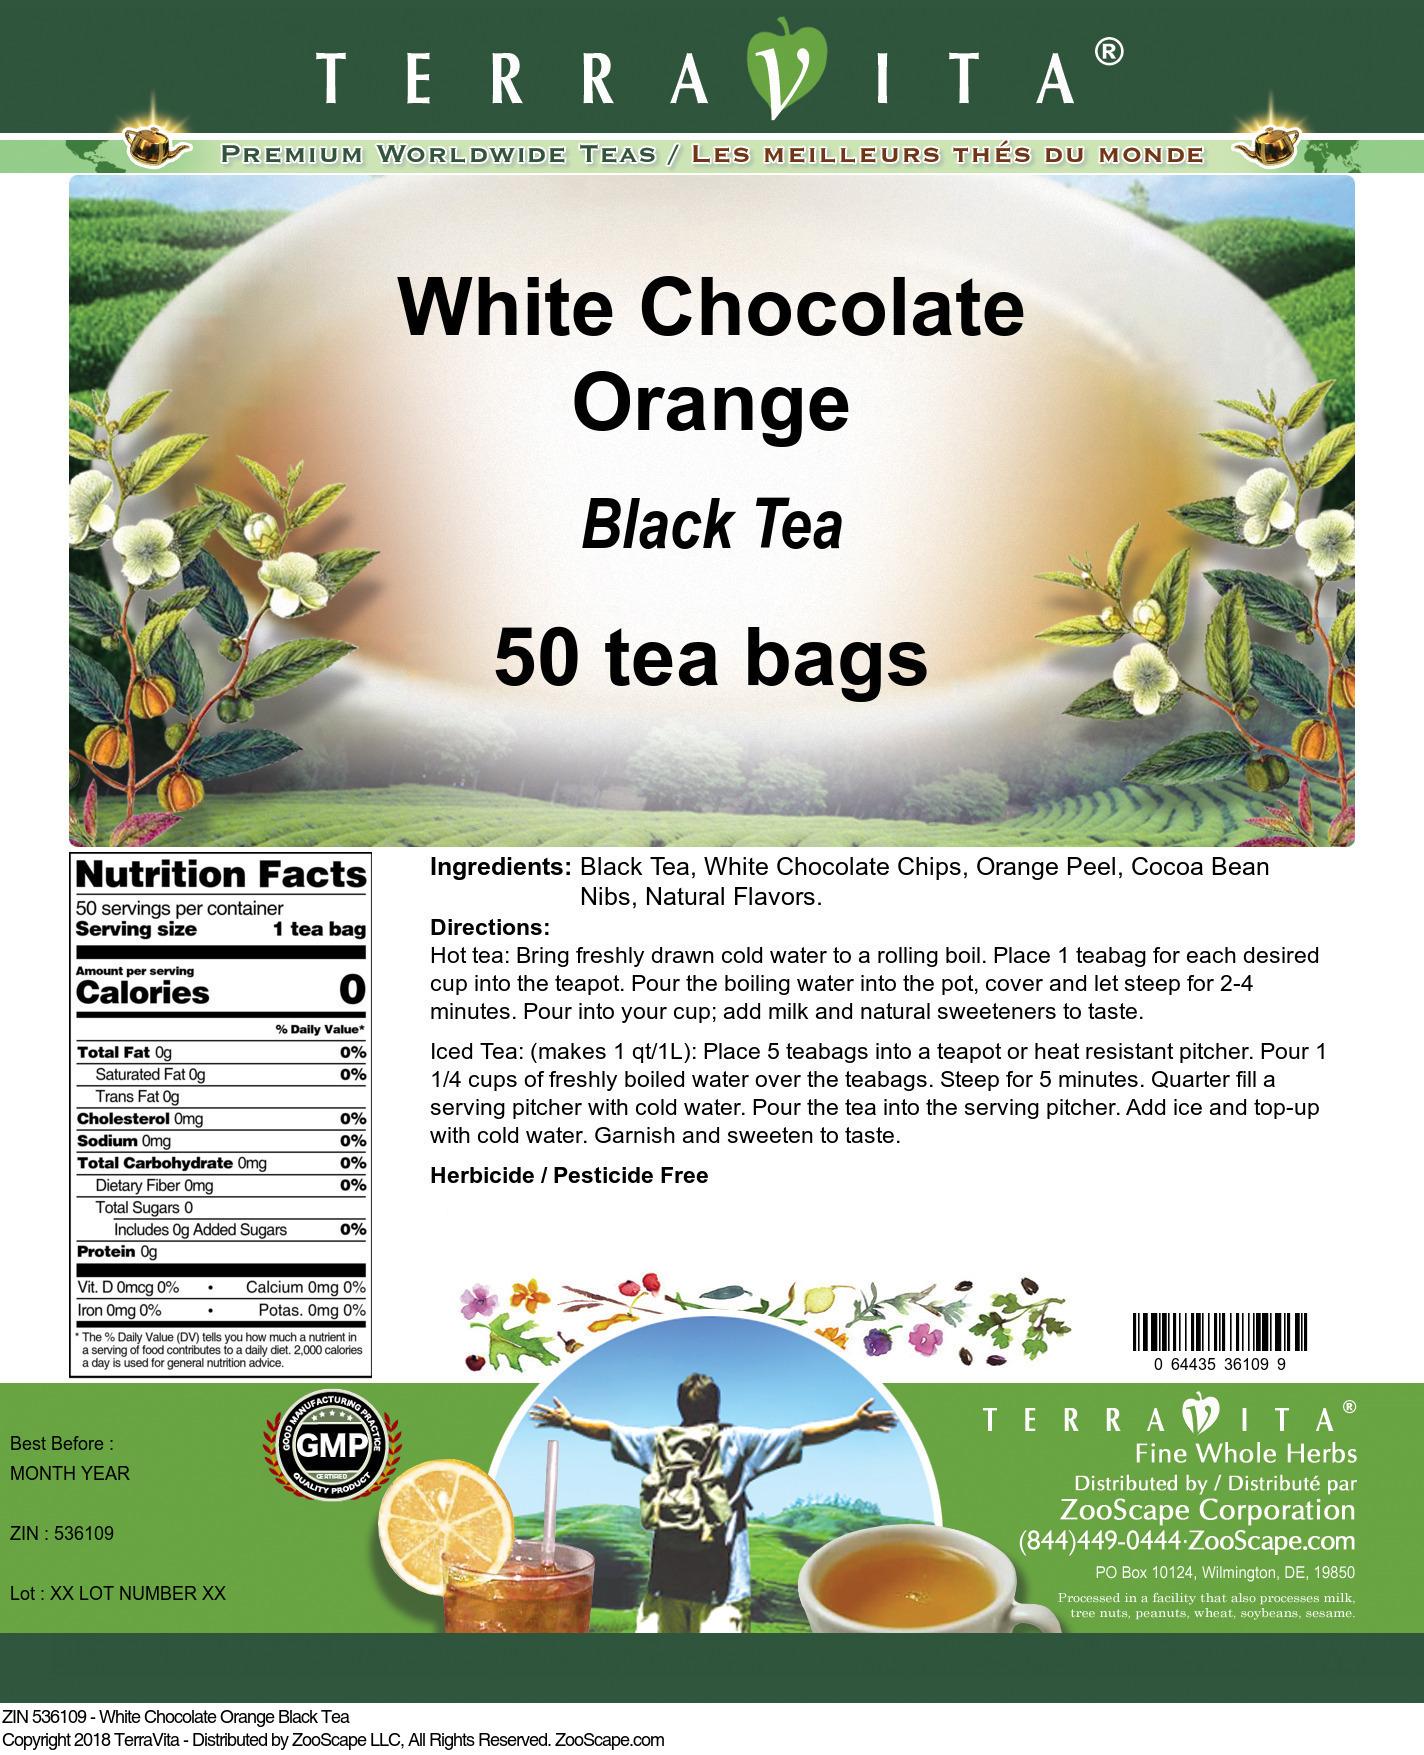 White Chocolate Orange Black Tea